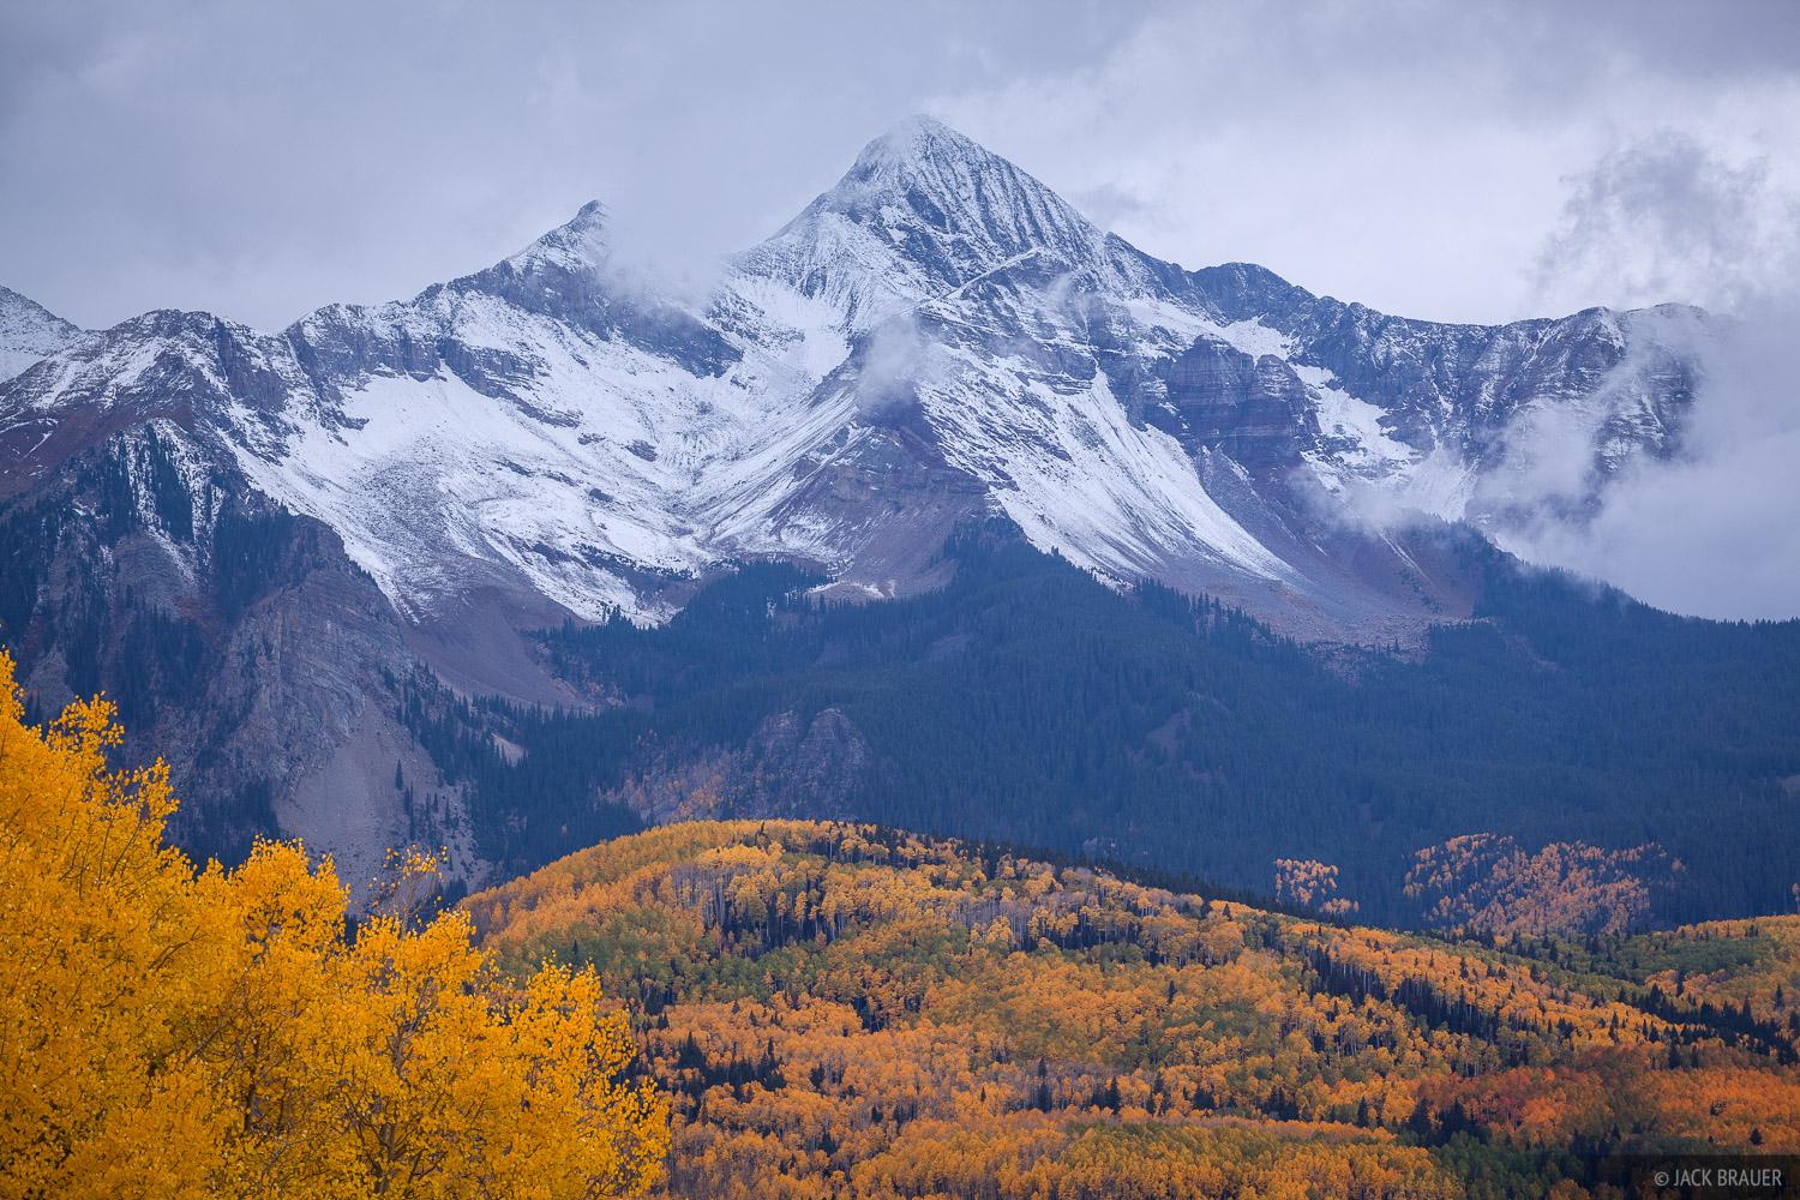 Colorado, San Juan Mountains, Wilson Peak, autumn, fall, San Miguel Range, photo